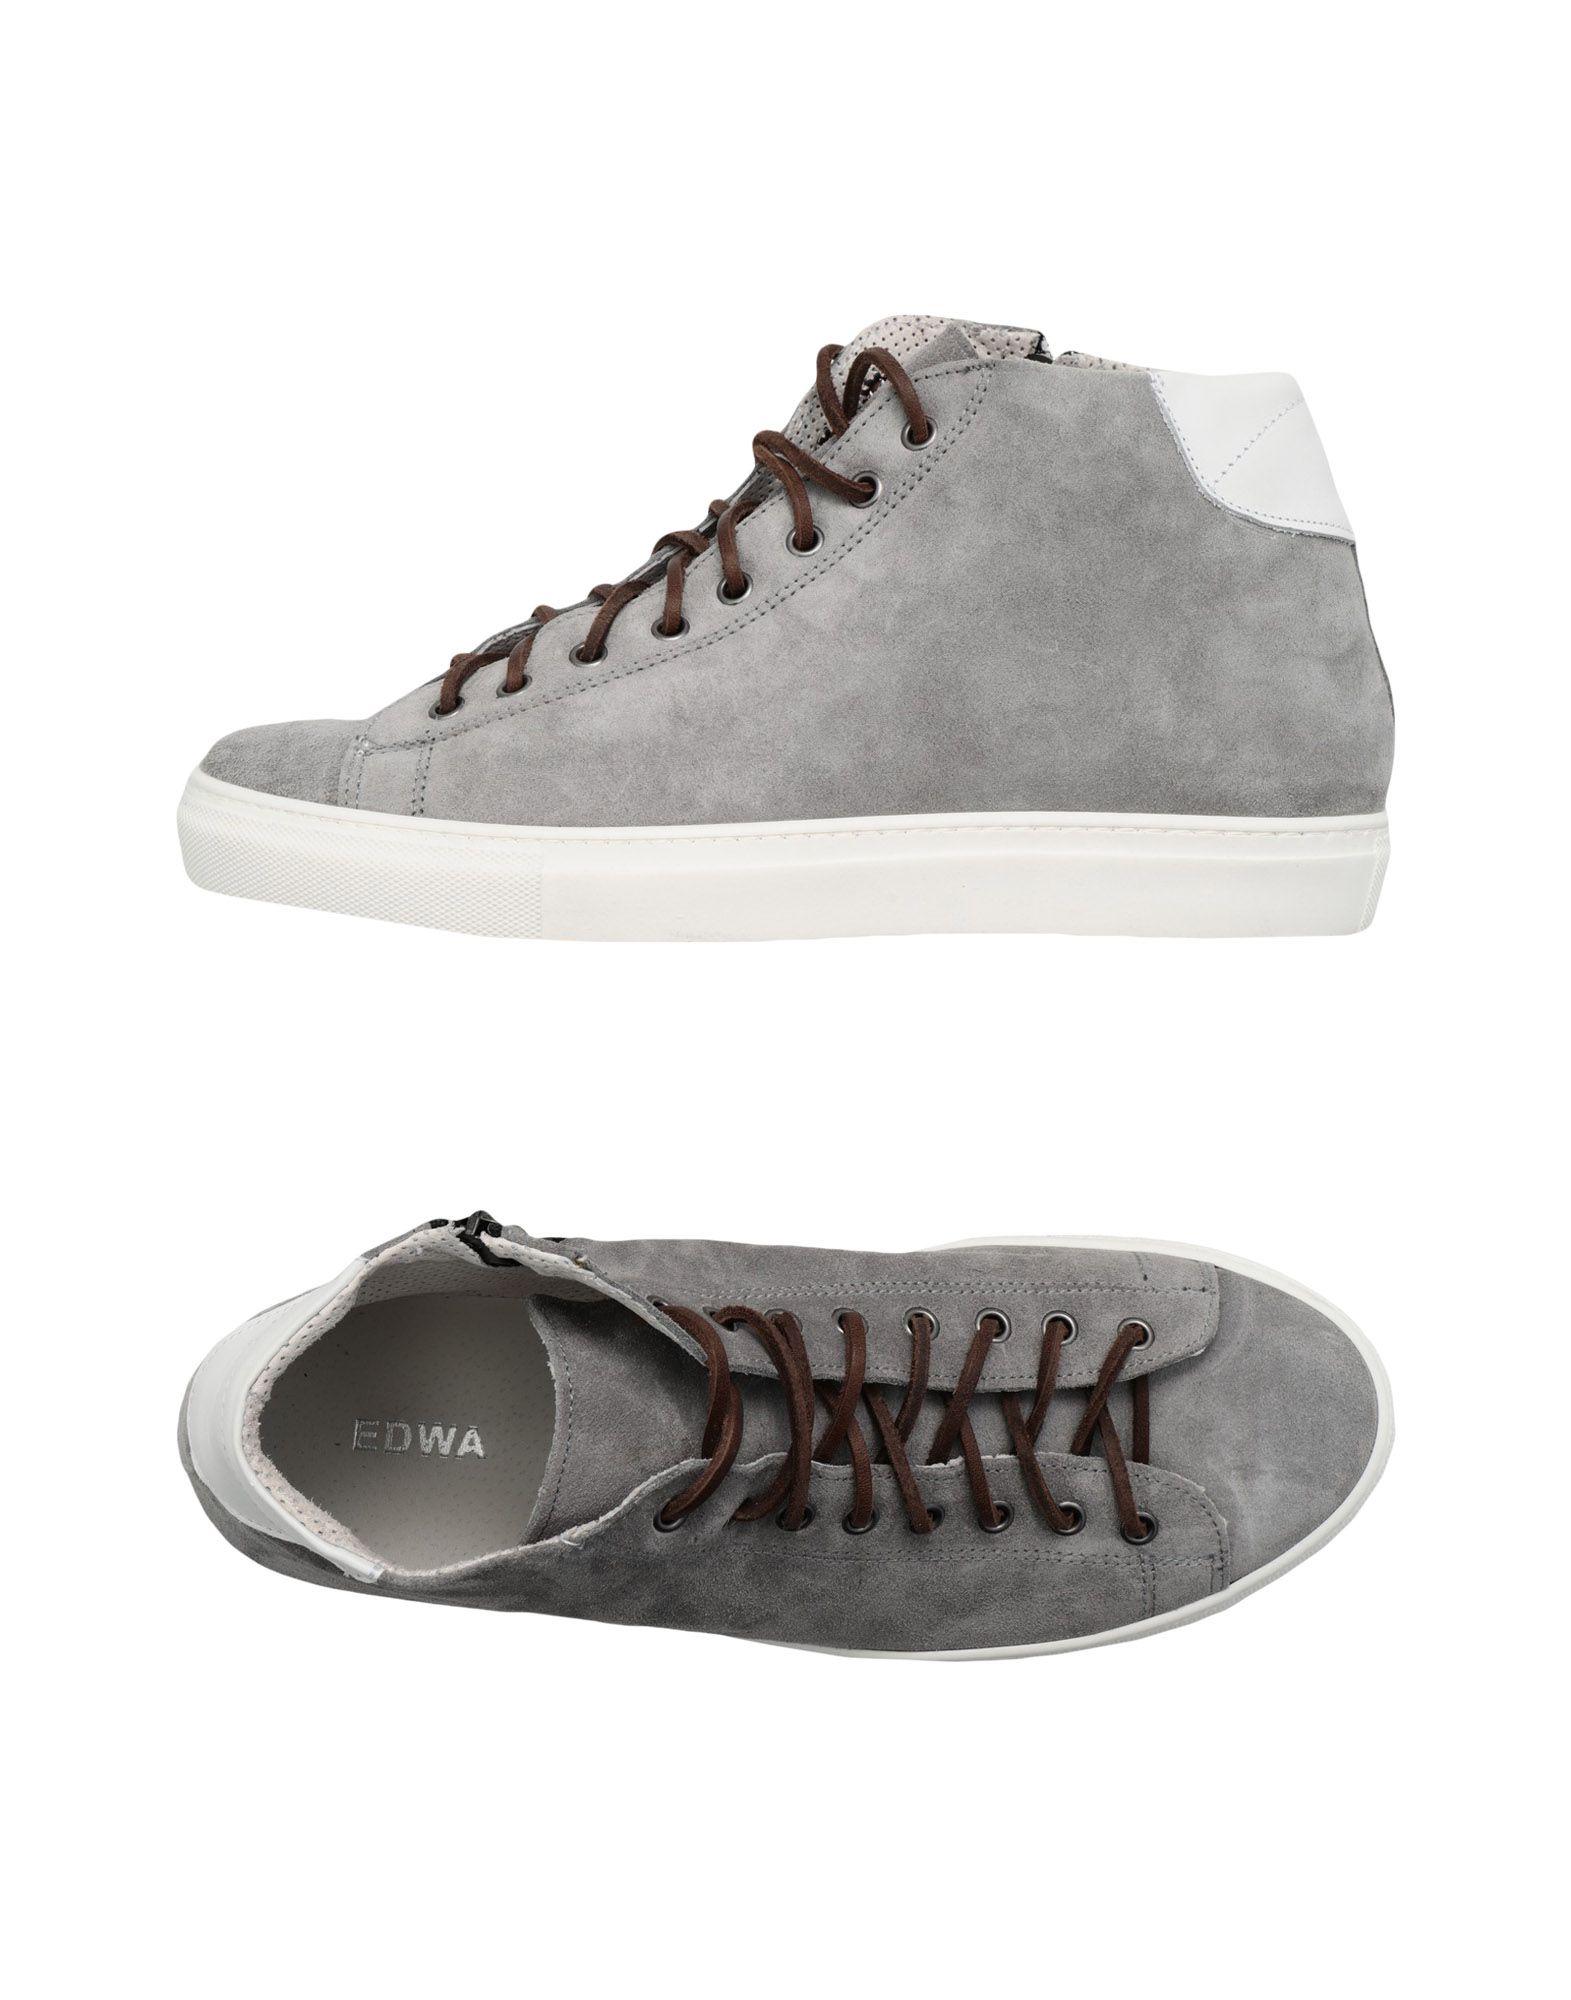 Rabatt echte Schuhe Edwa Sneakers Herren  11458255VC